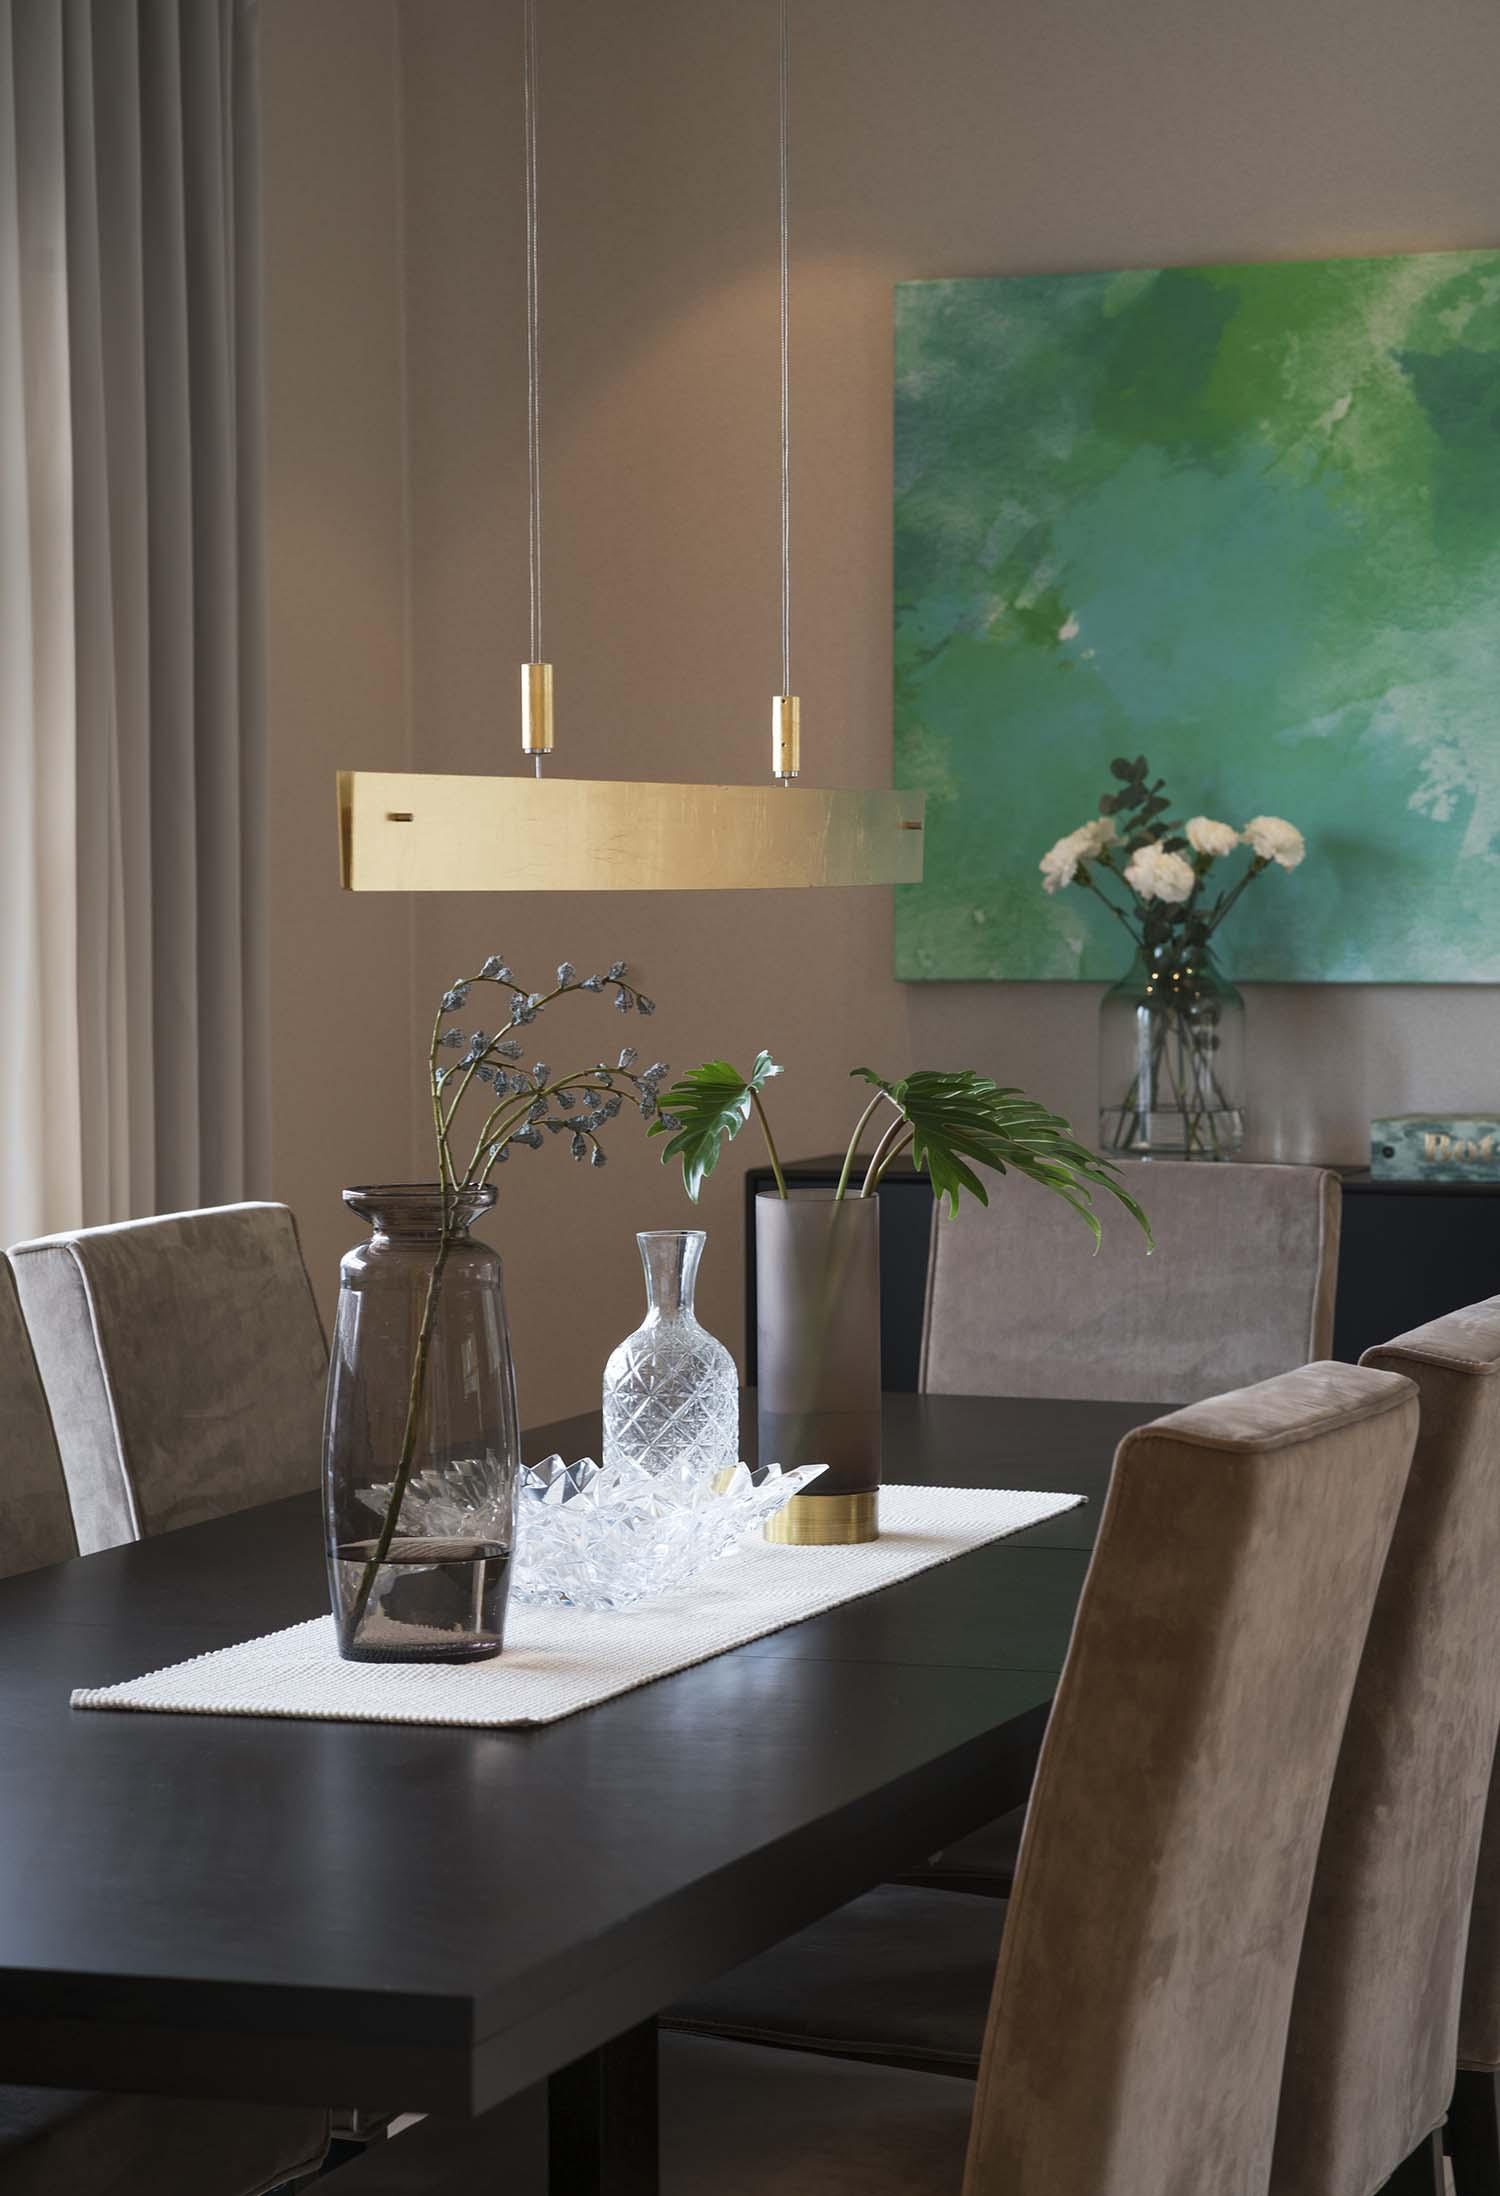 spisestue, interiør, dekor, bordpynt